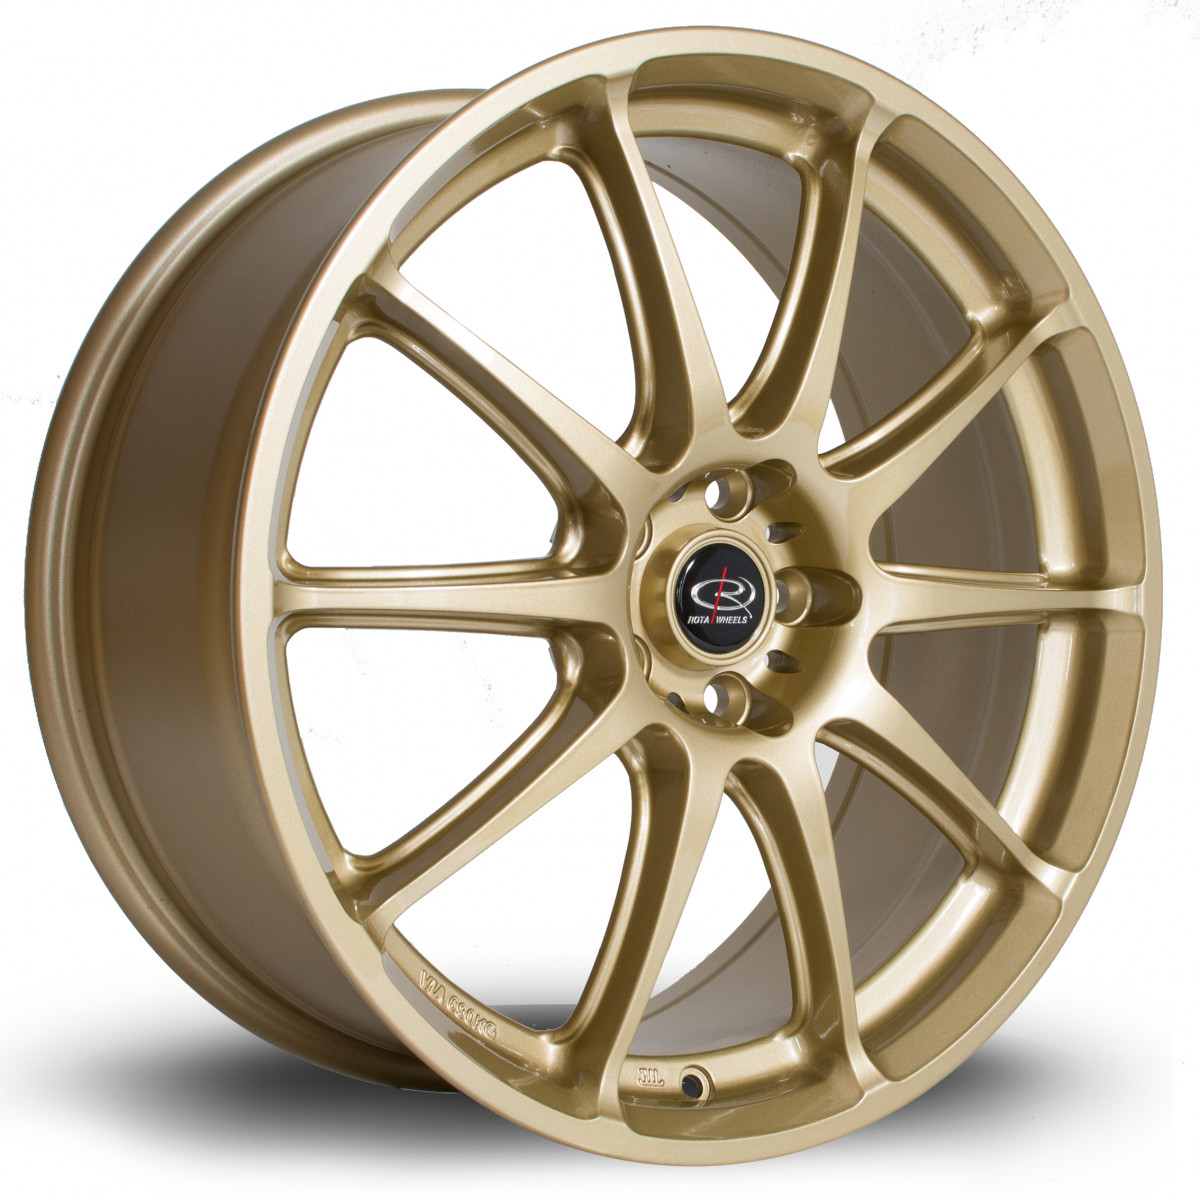 Gra 18x7.5 5x100 ET48 Gold